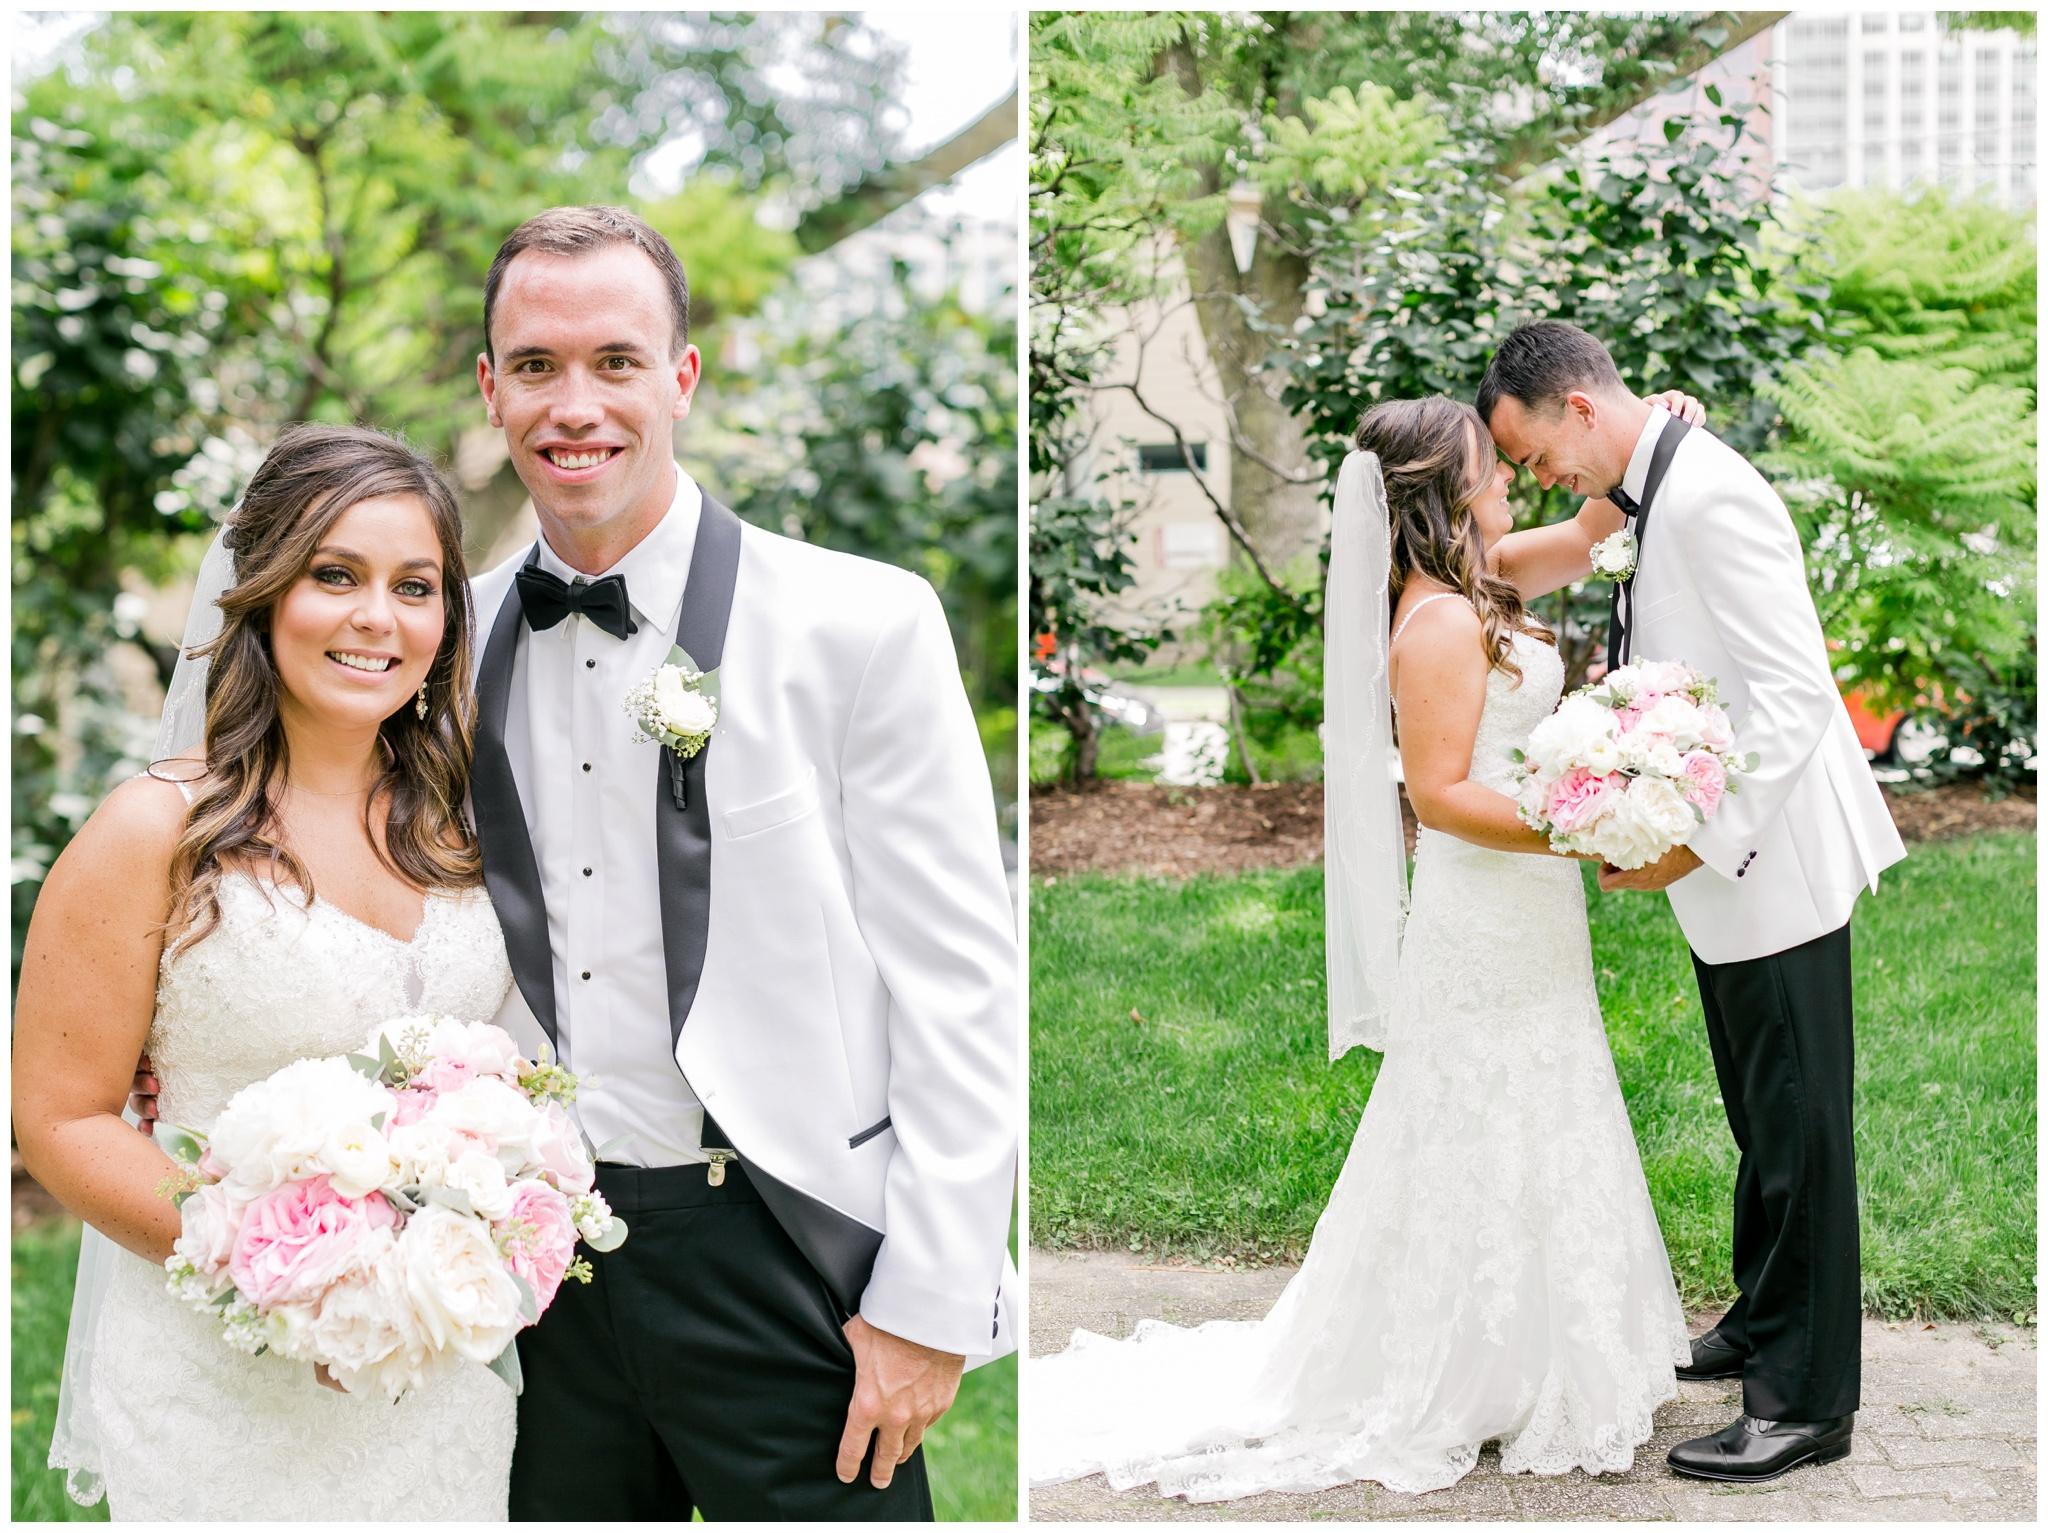 UW_Memorial_Union_wedding_madison_wisconsin_wedding_photographers_4592.jpg